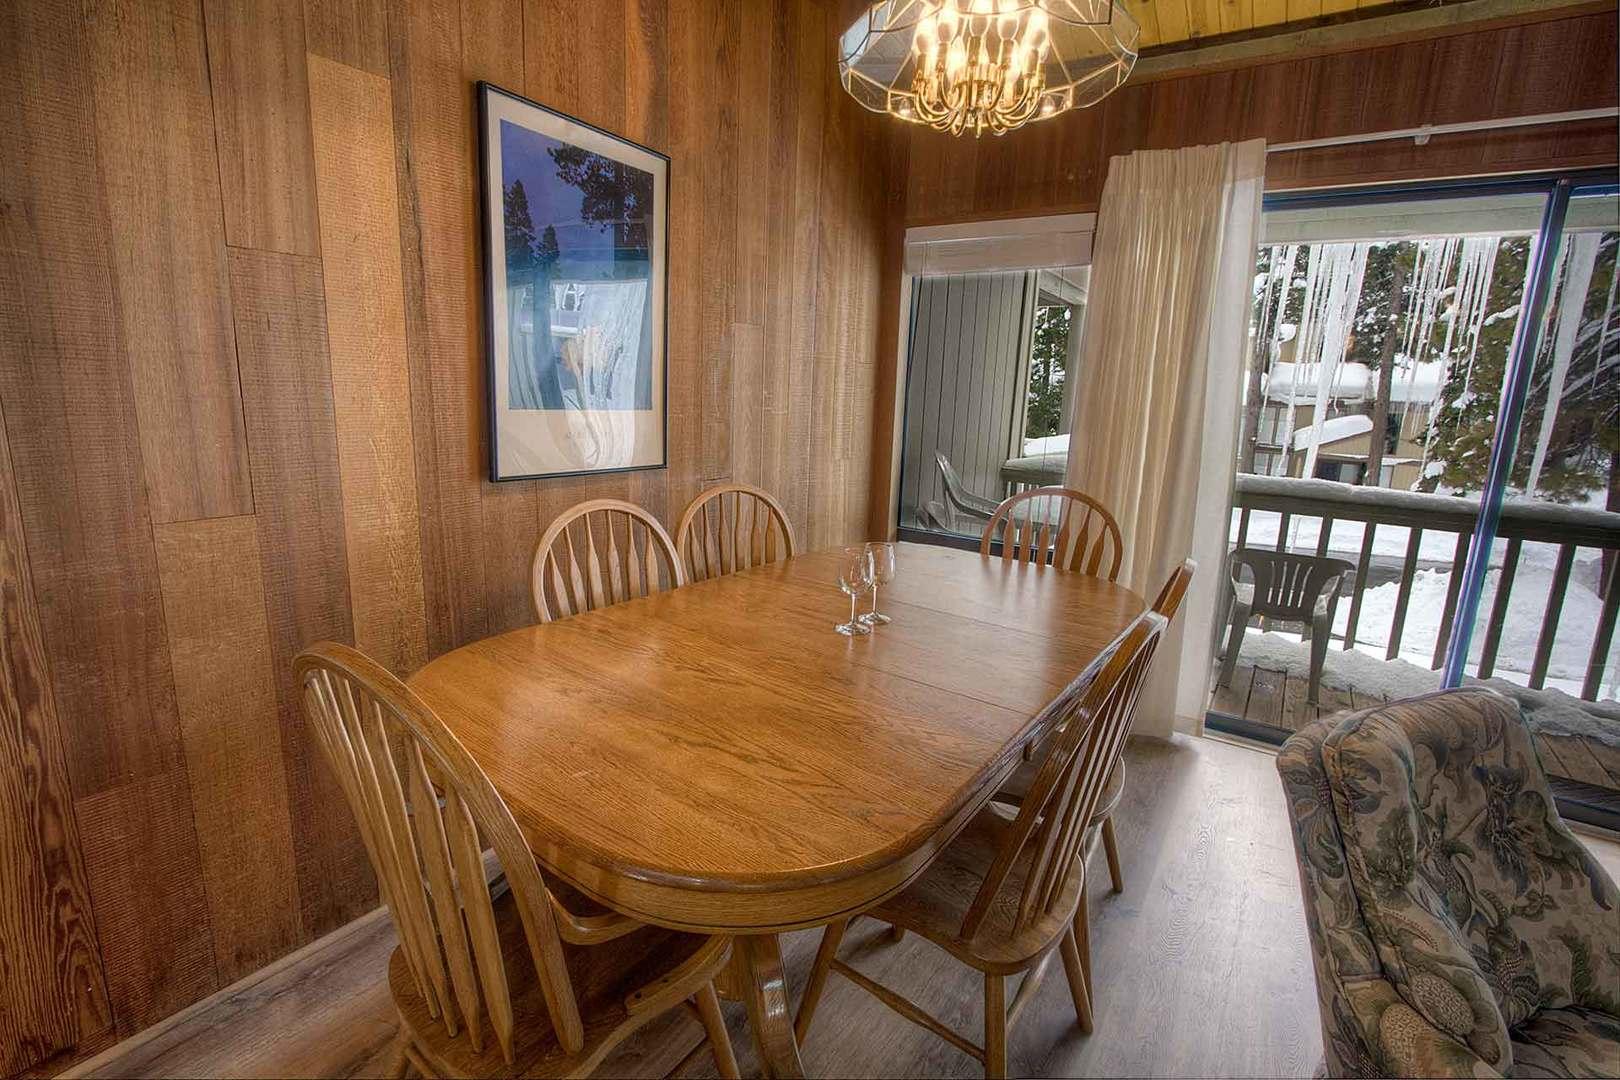 kwc1030 dining Room